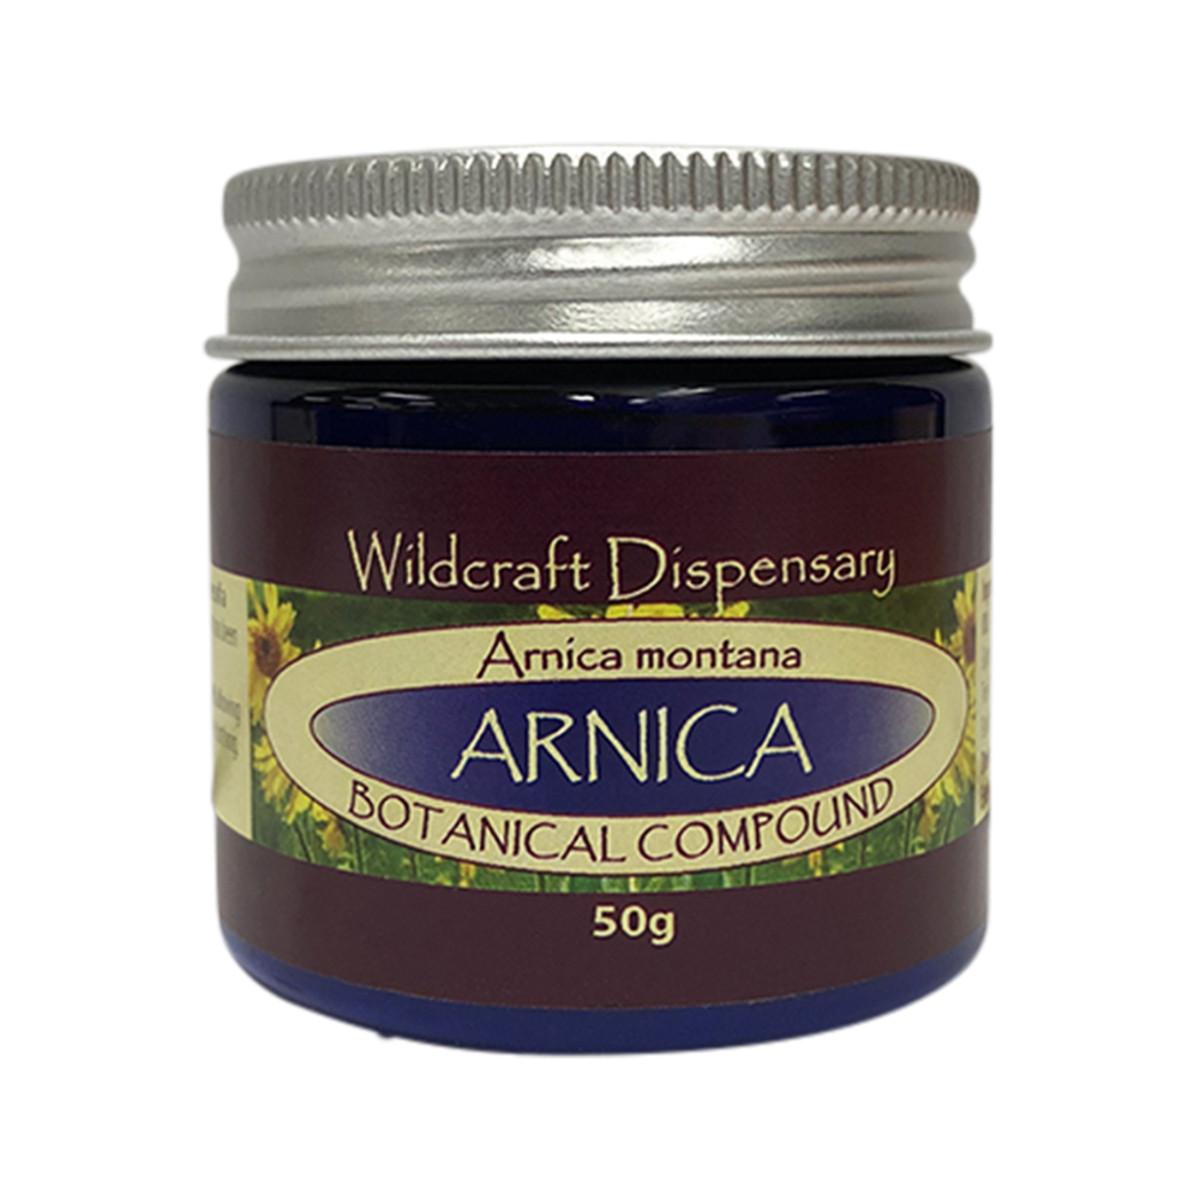 WILDCRAFT DISPENSARY ARNICA OINTMENT 50G